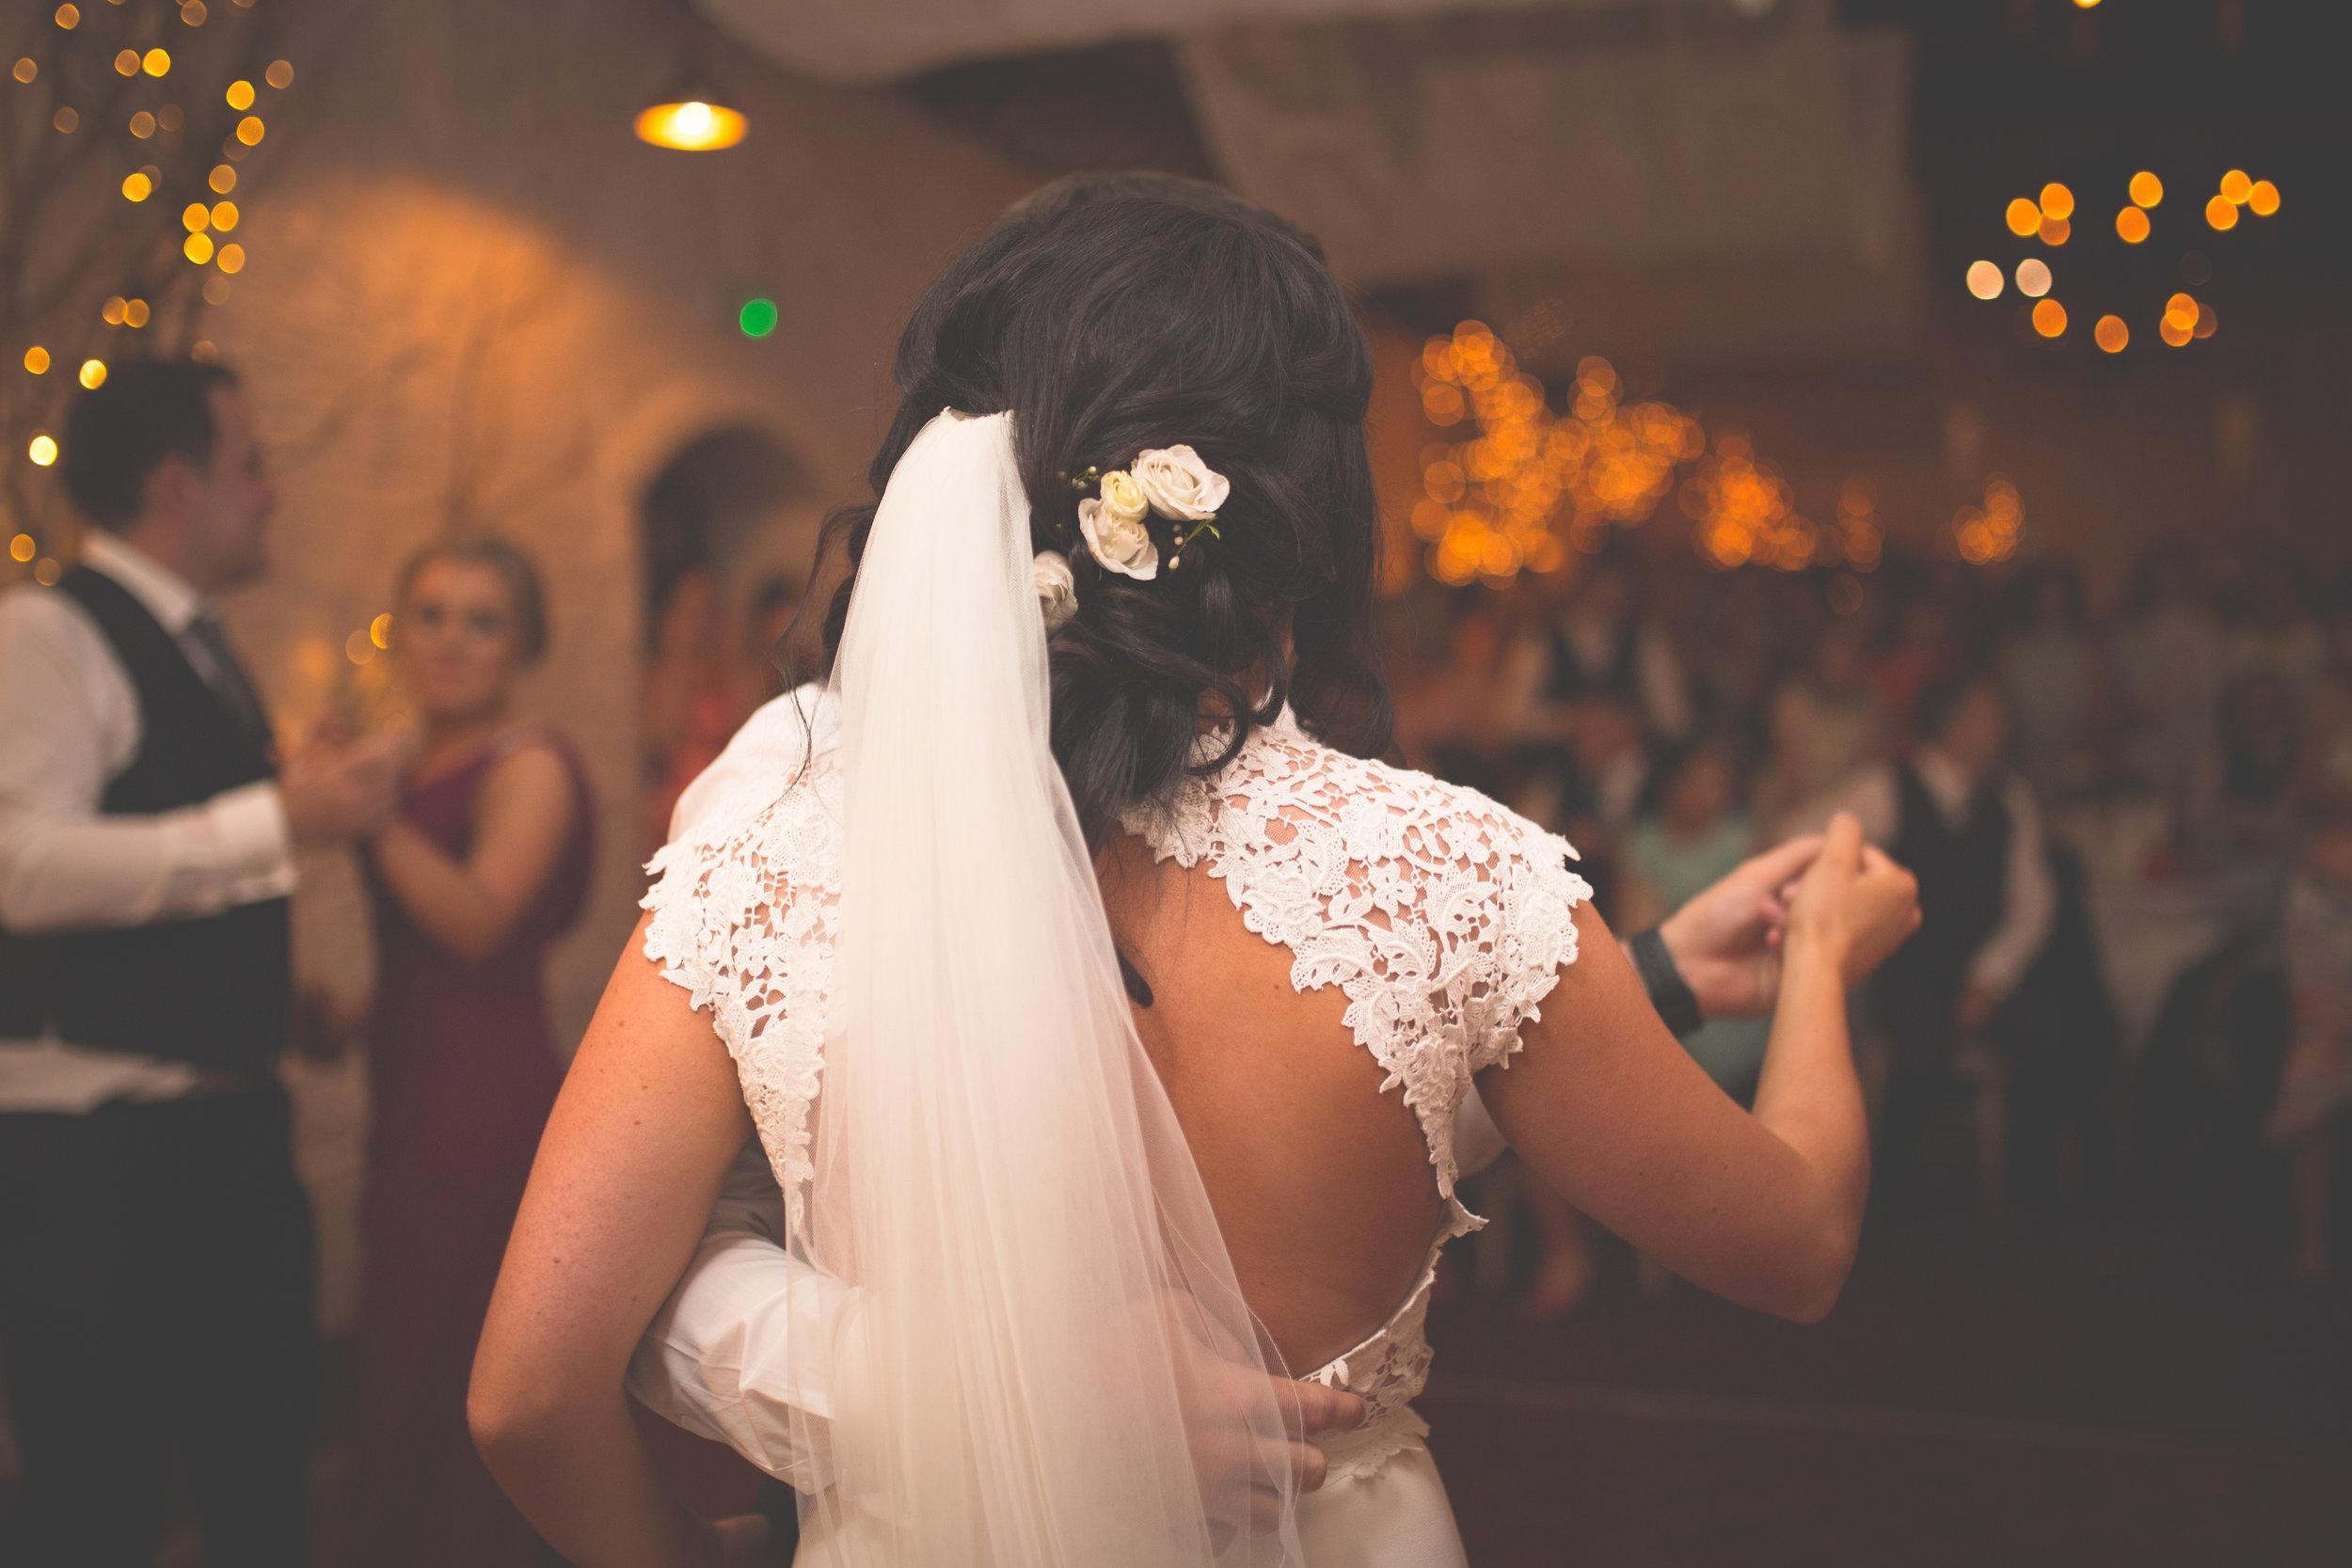 Brian McEwan Wedding Photography | Carol-Annee & Sean | The Dancing-35.jpg